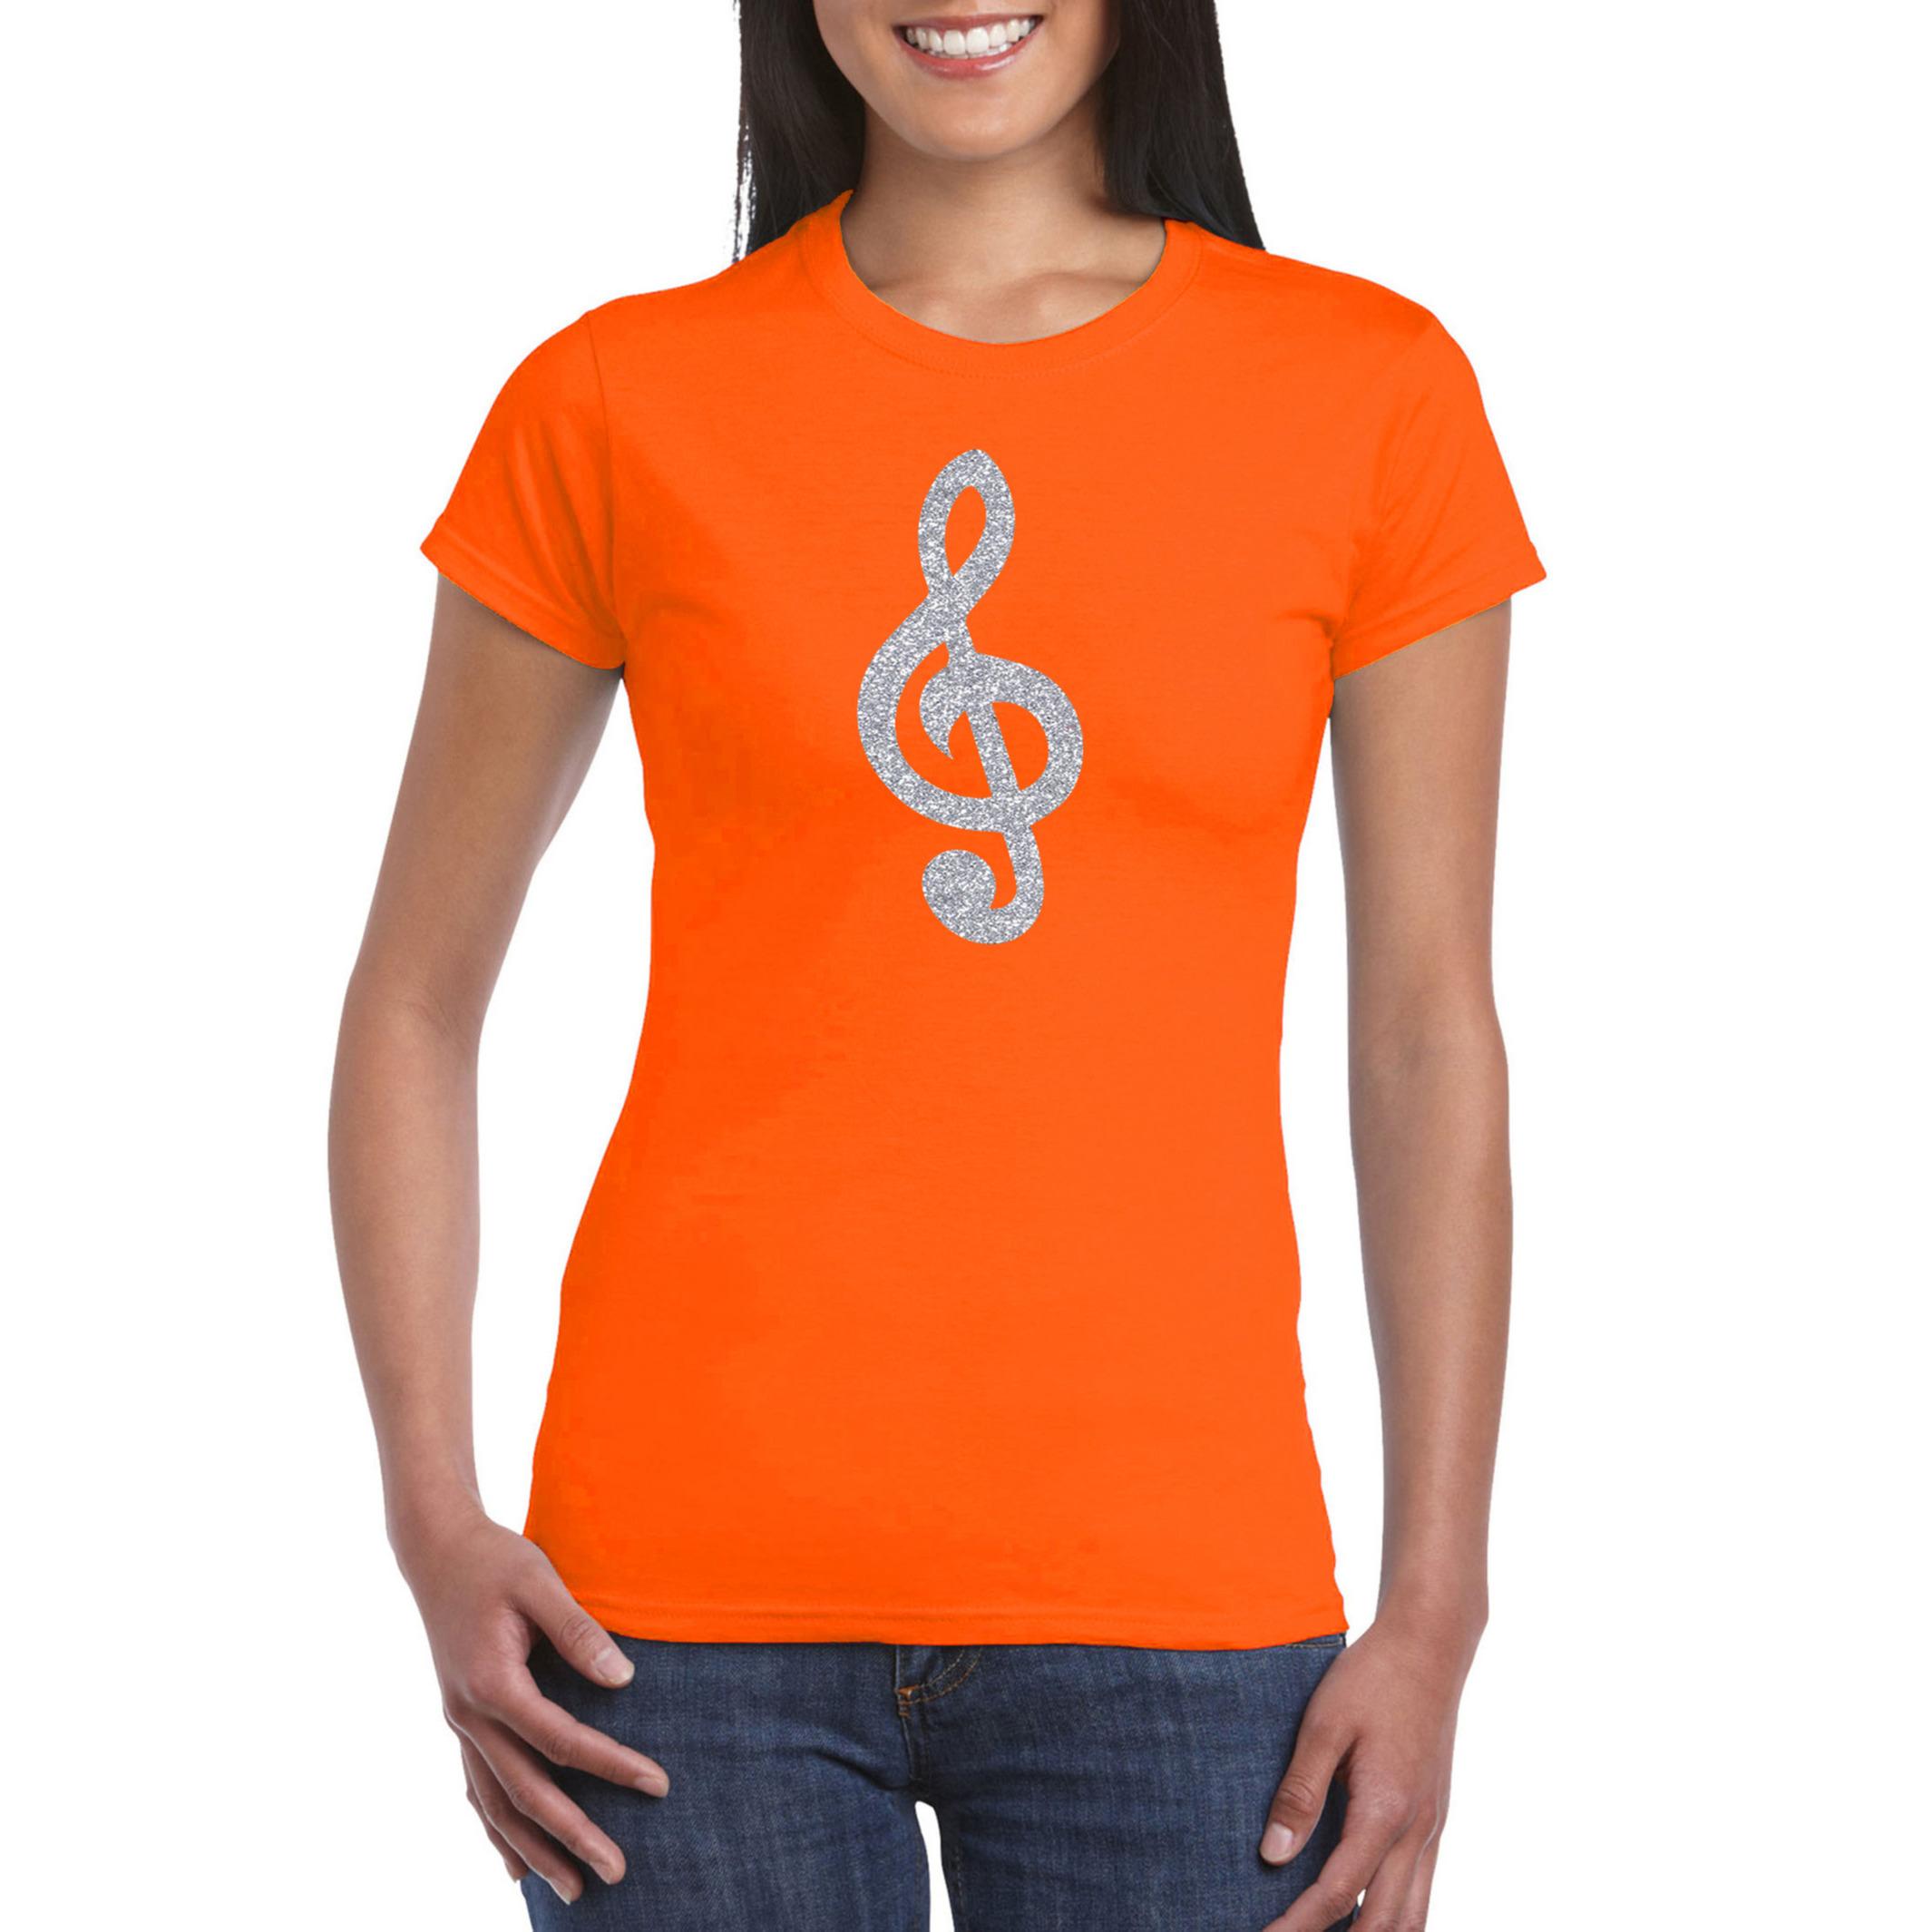 Zilveren muzieknoot G-sleutel - muziek feest t-shirt - kleding oranje dames